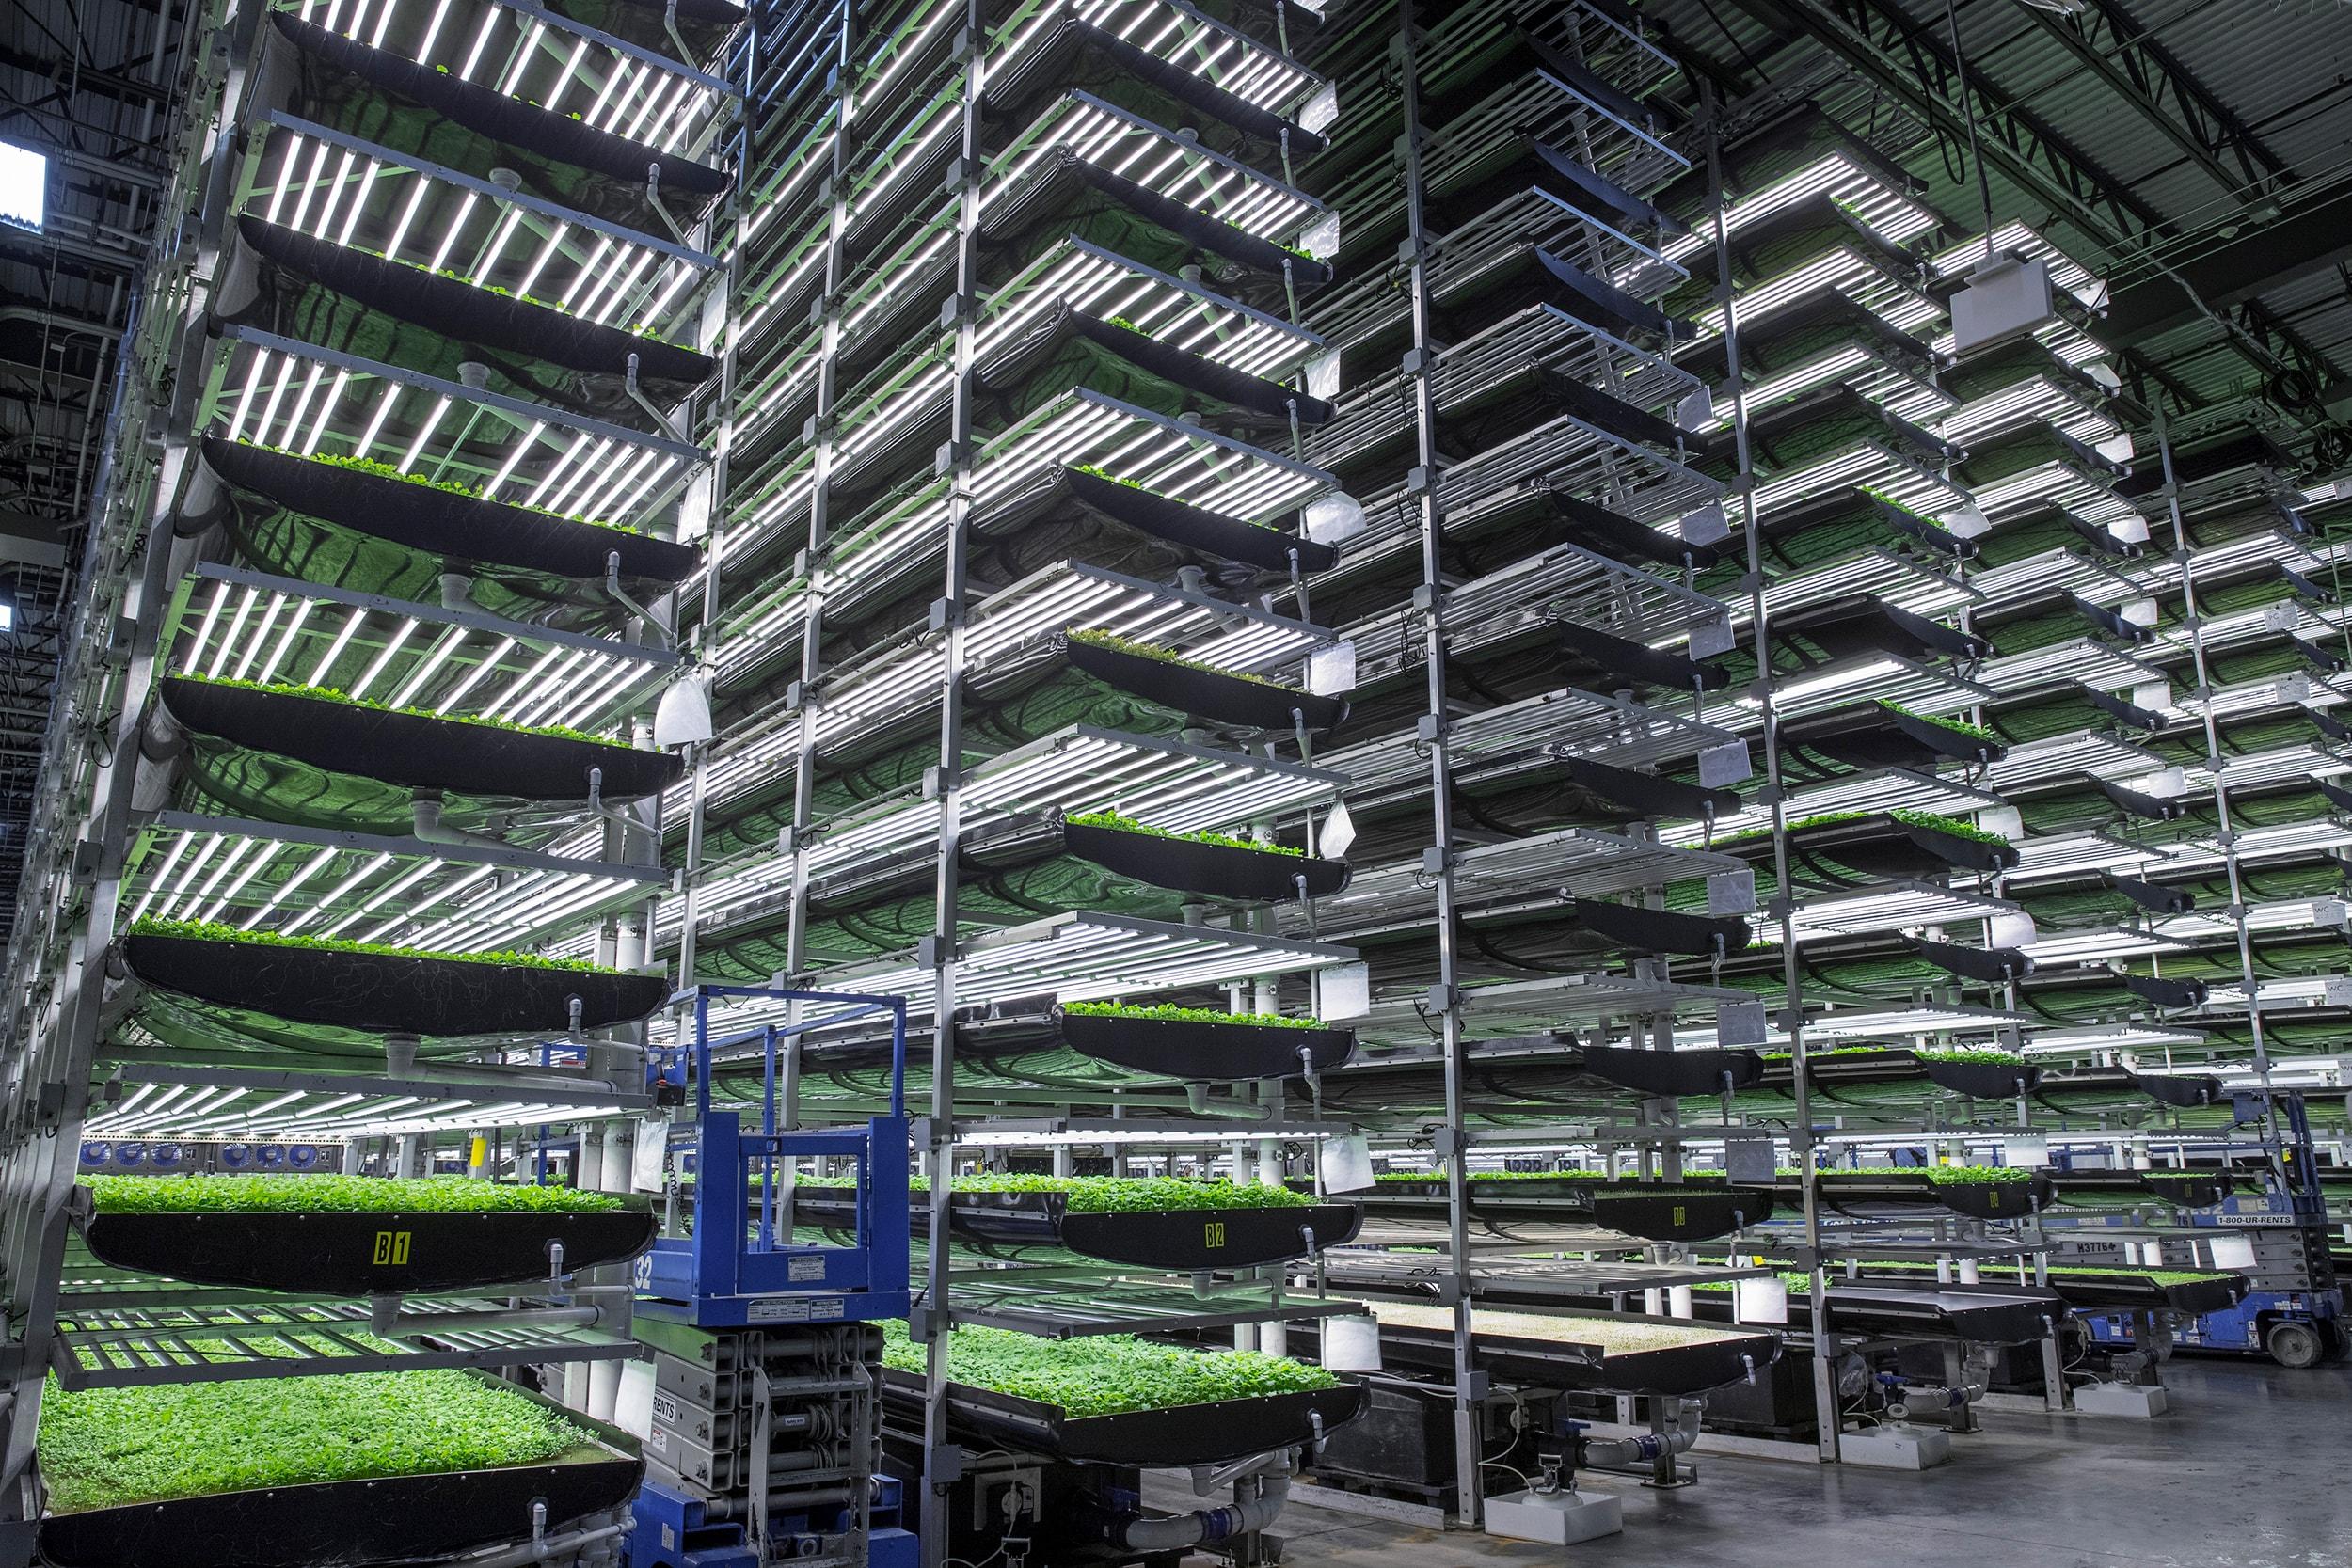 worlds largest indoor vertical - photo #18